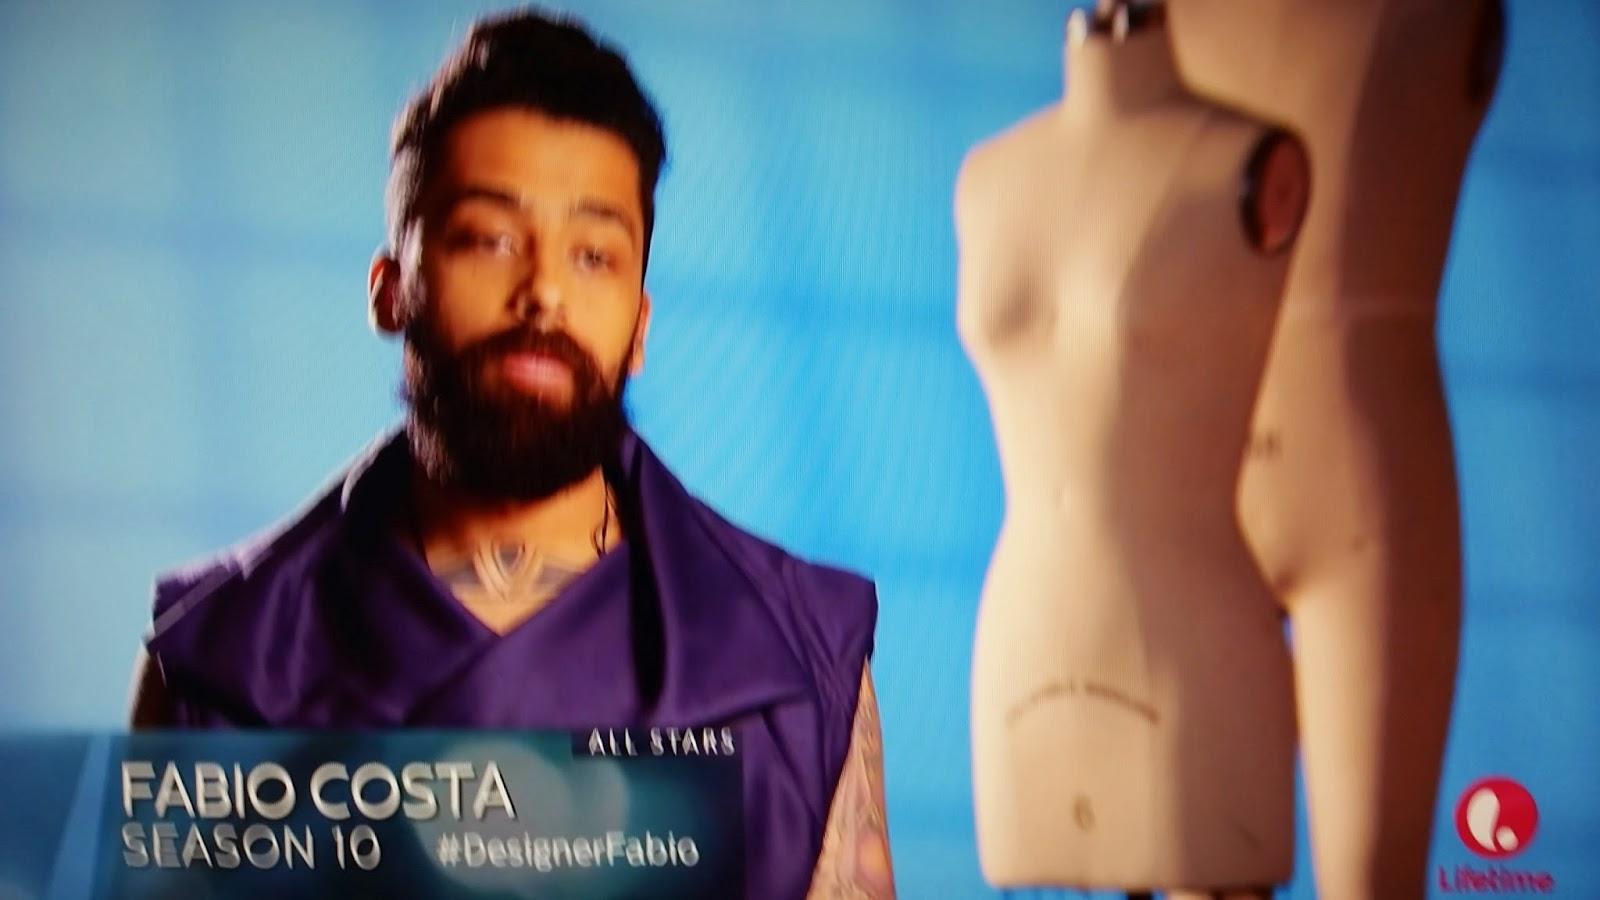 Fabio Costa Project Runway All Stars